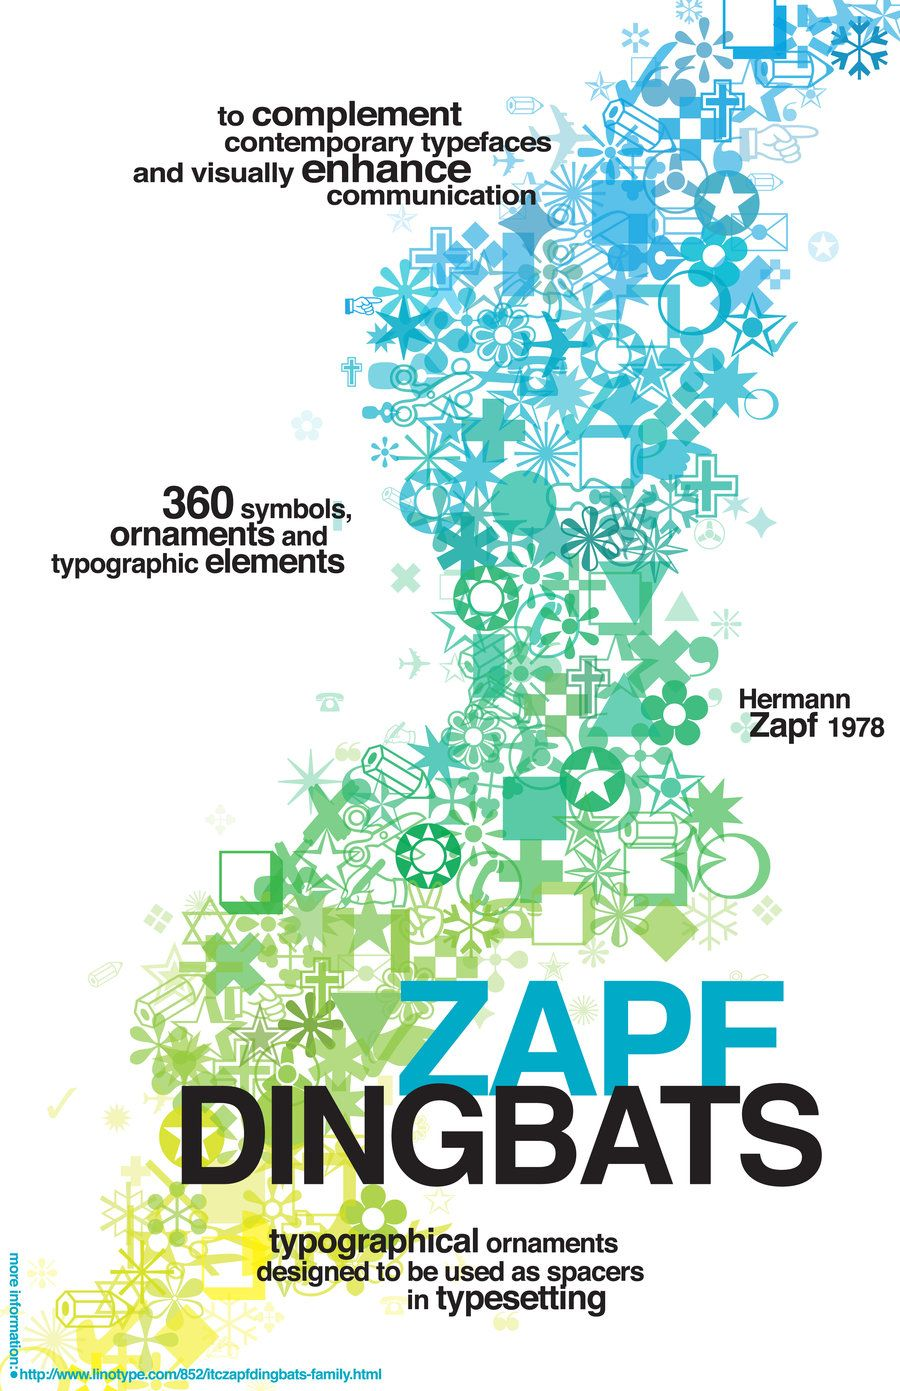 Poster design deviantart - Zapf Dingbats Poster By Butbrightlylit Deviantart Com